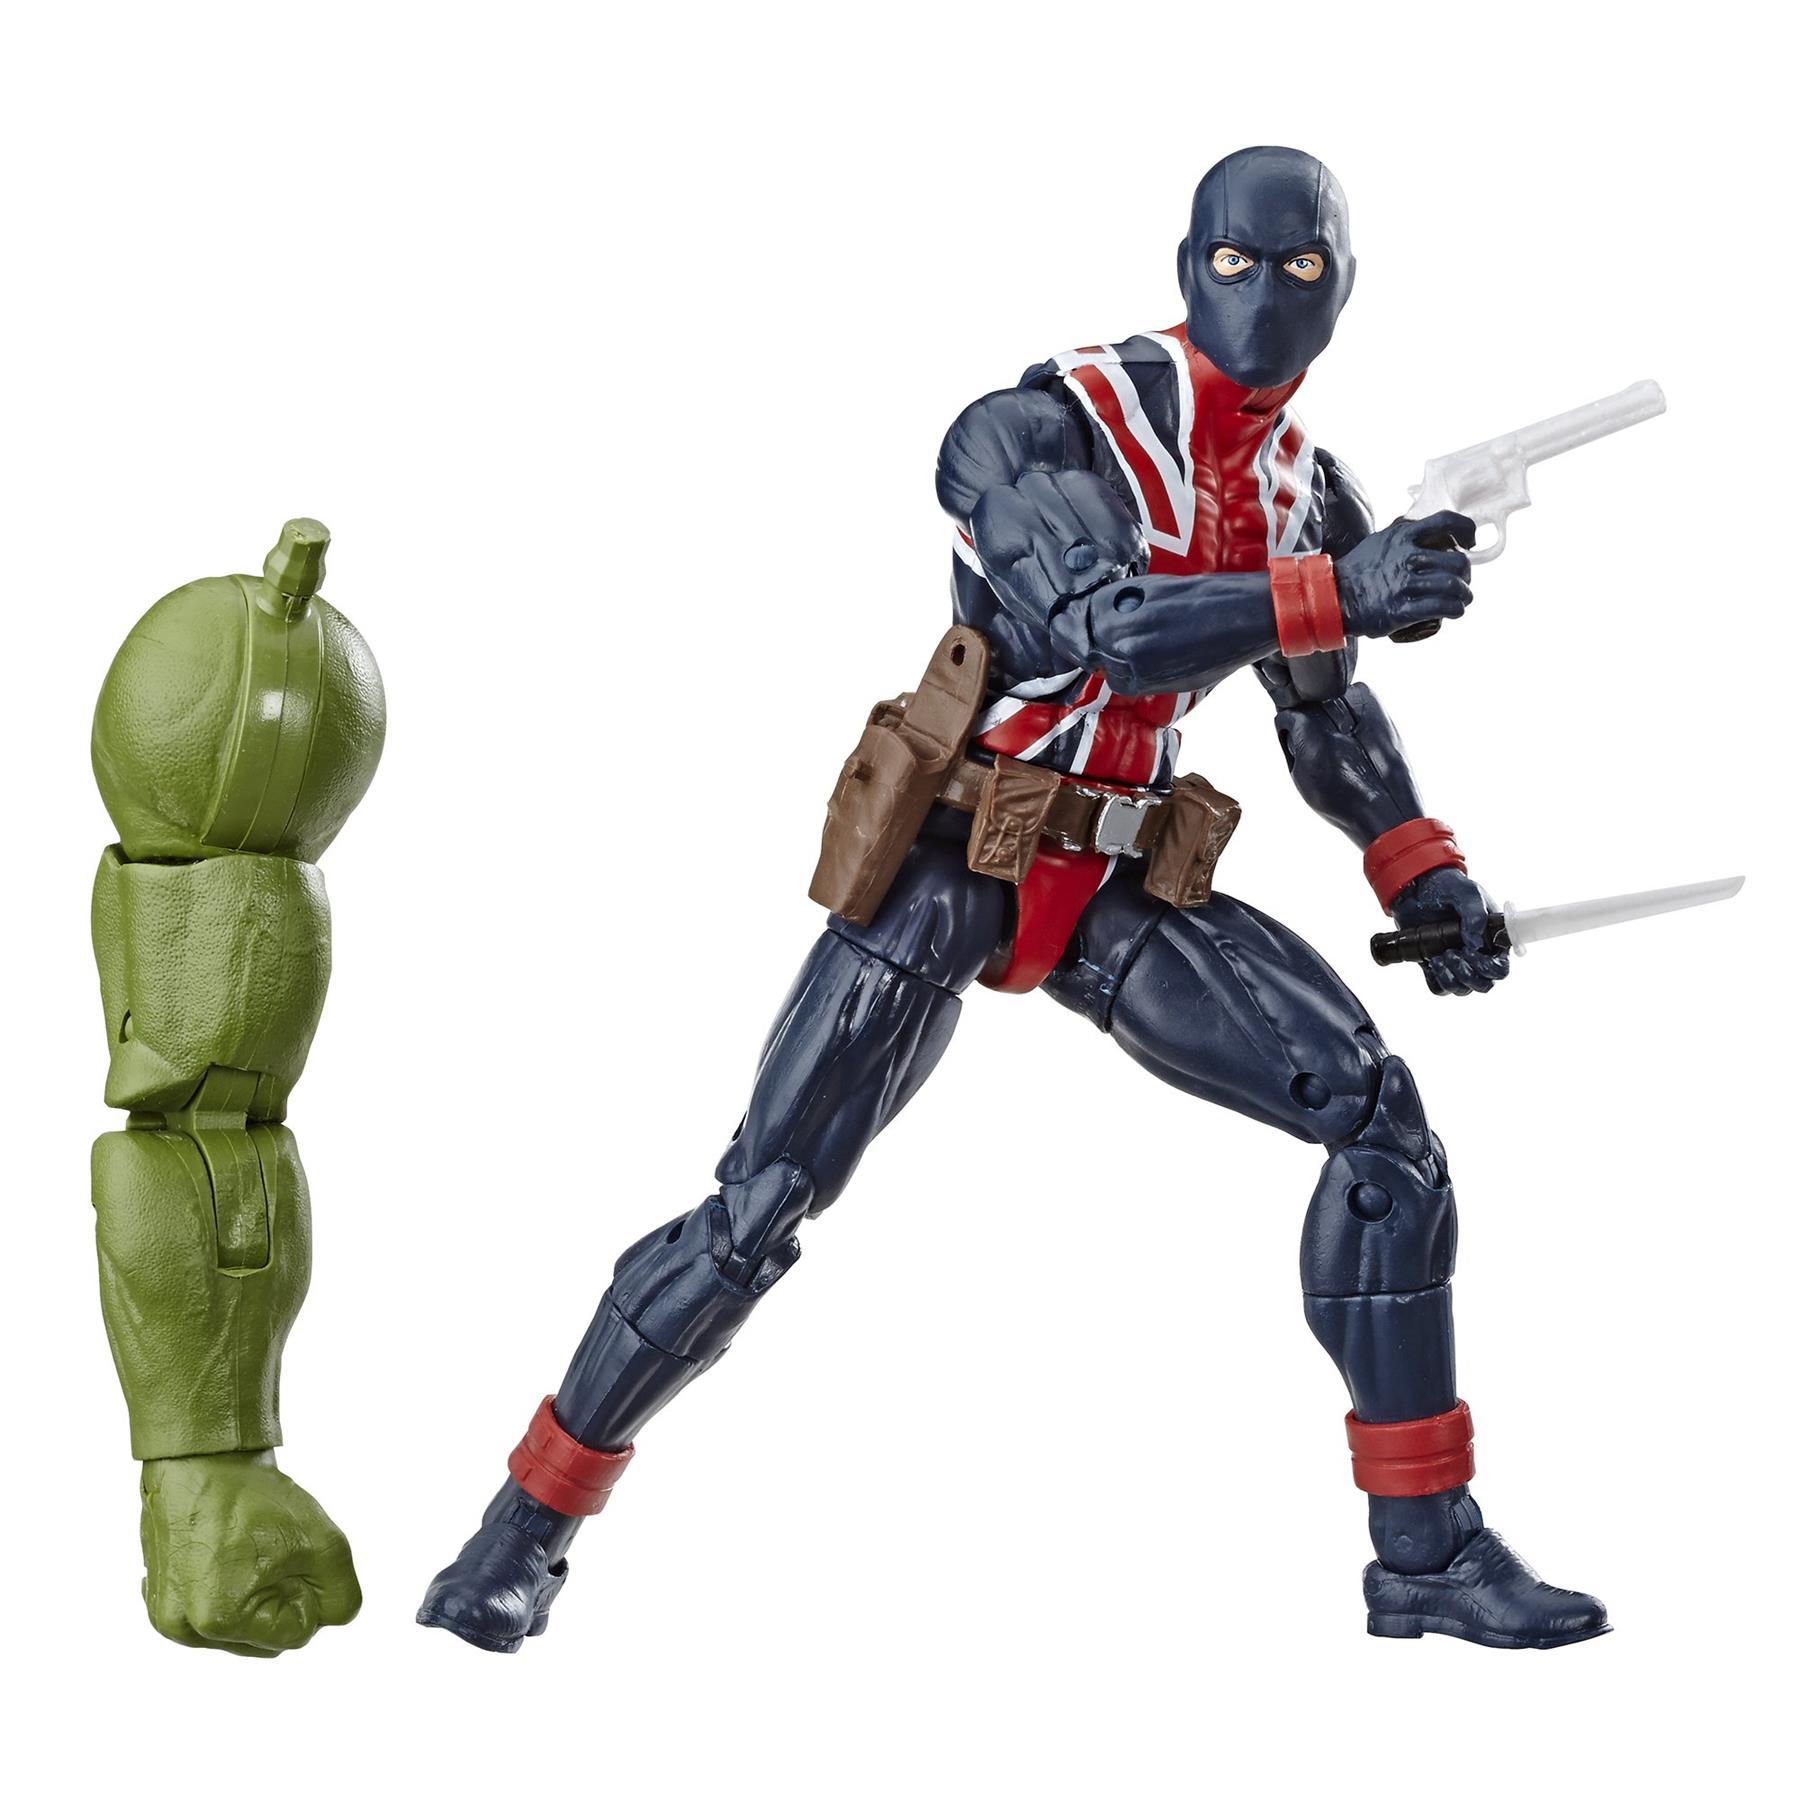 Marvel-Legends-Avengers-6-034-Action-Figures-Hulk-BAF thumbnail 13